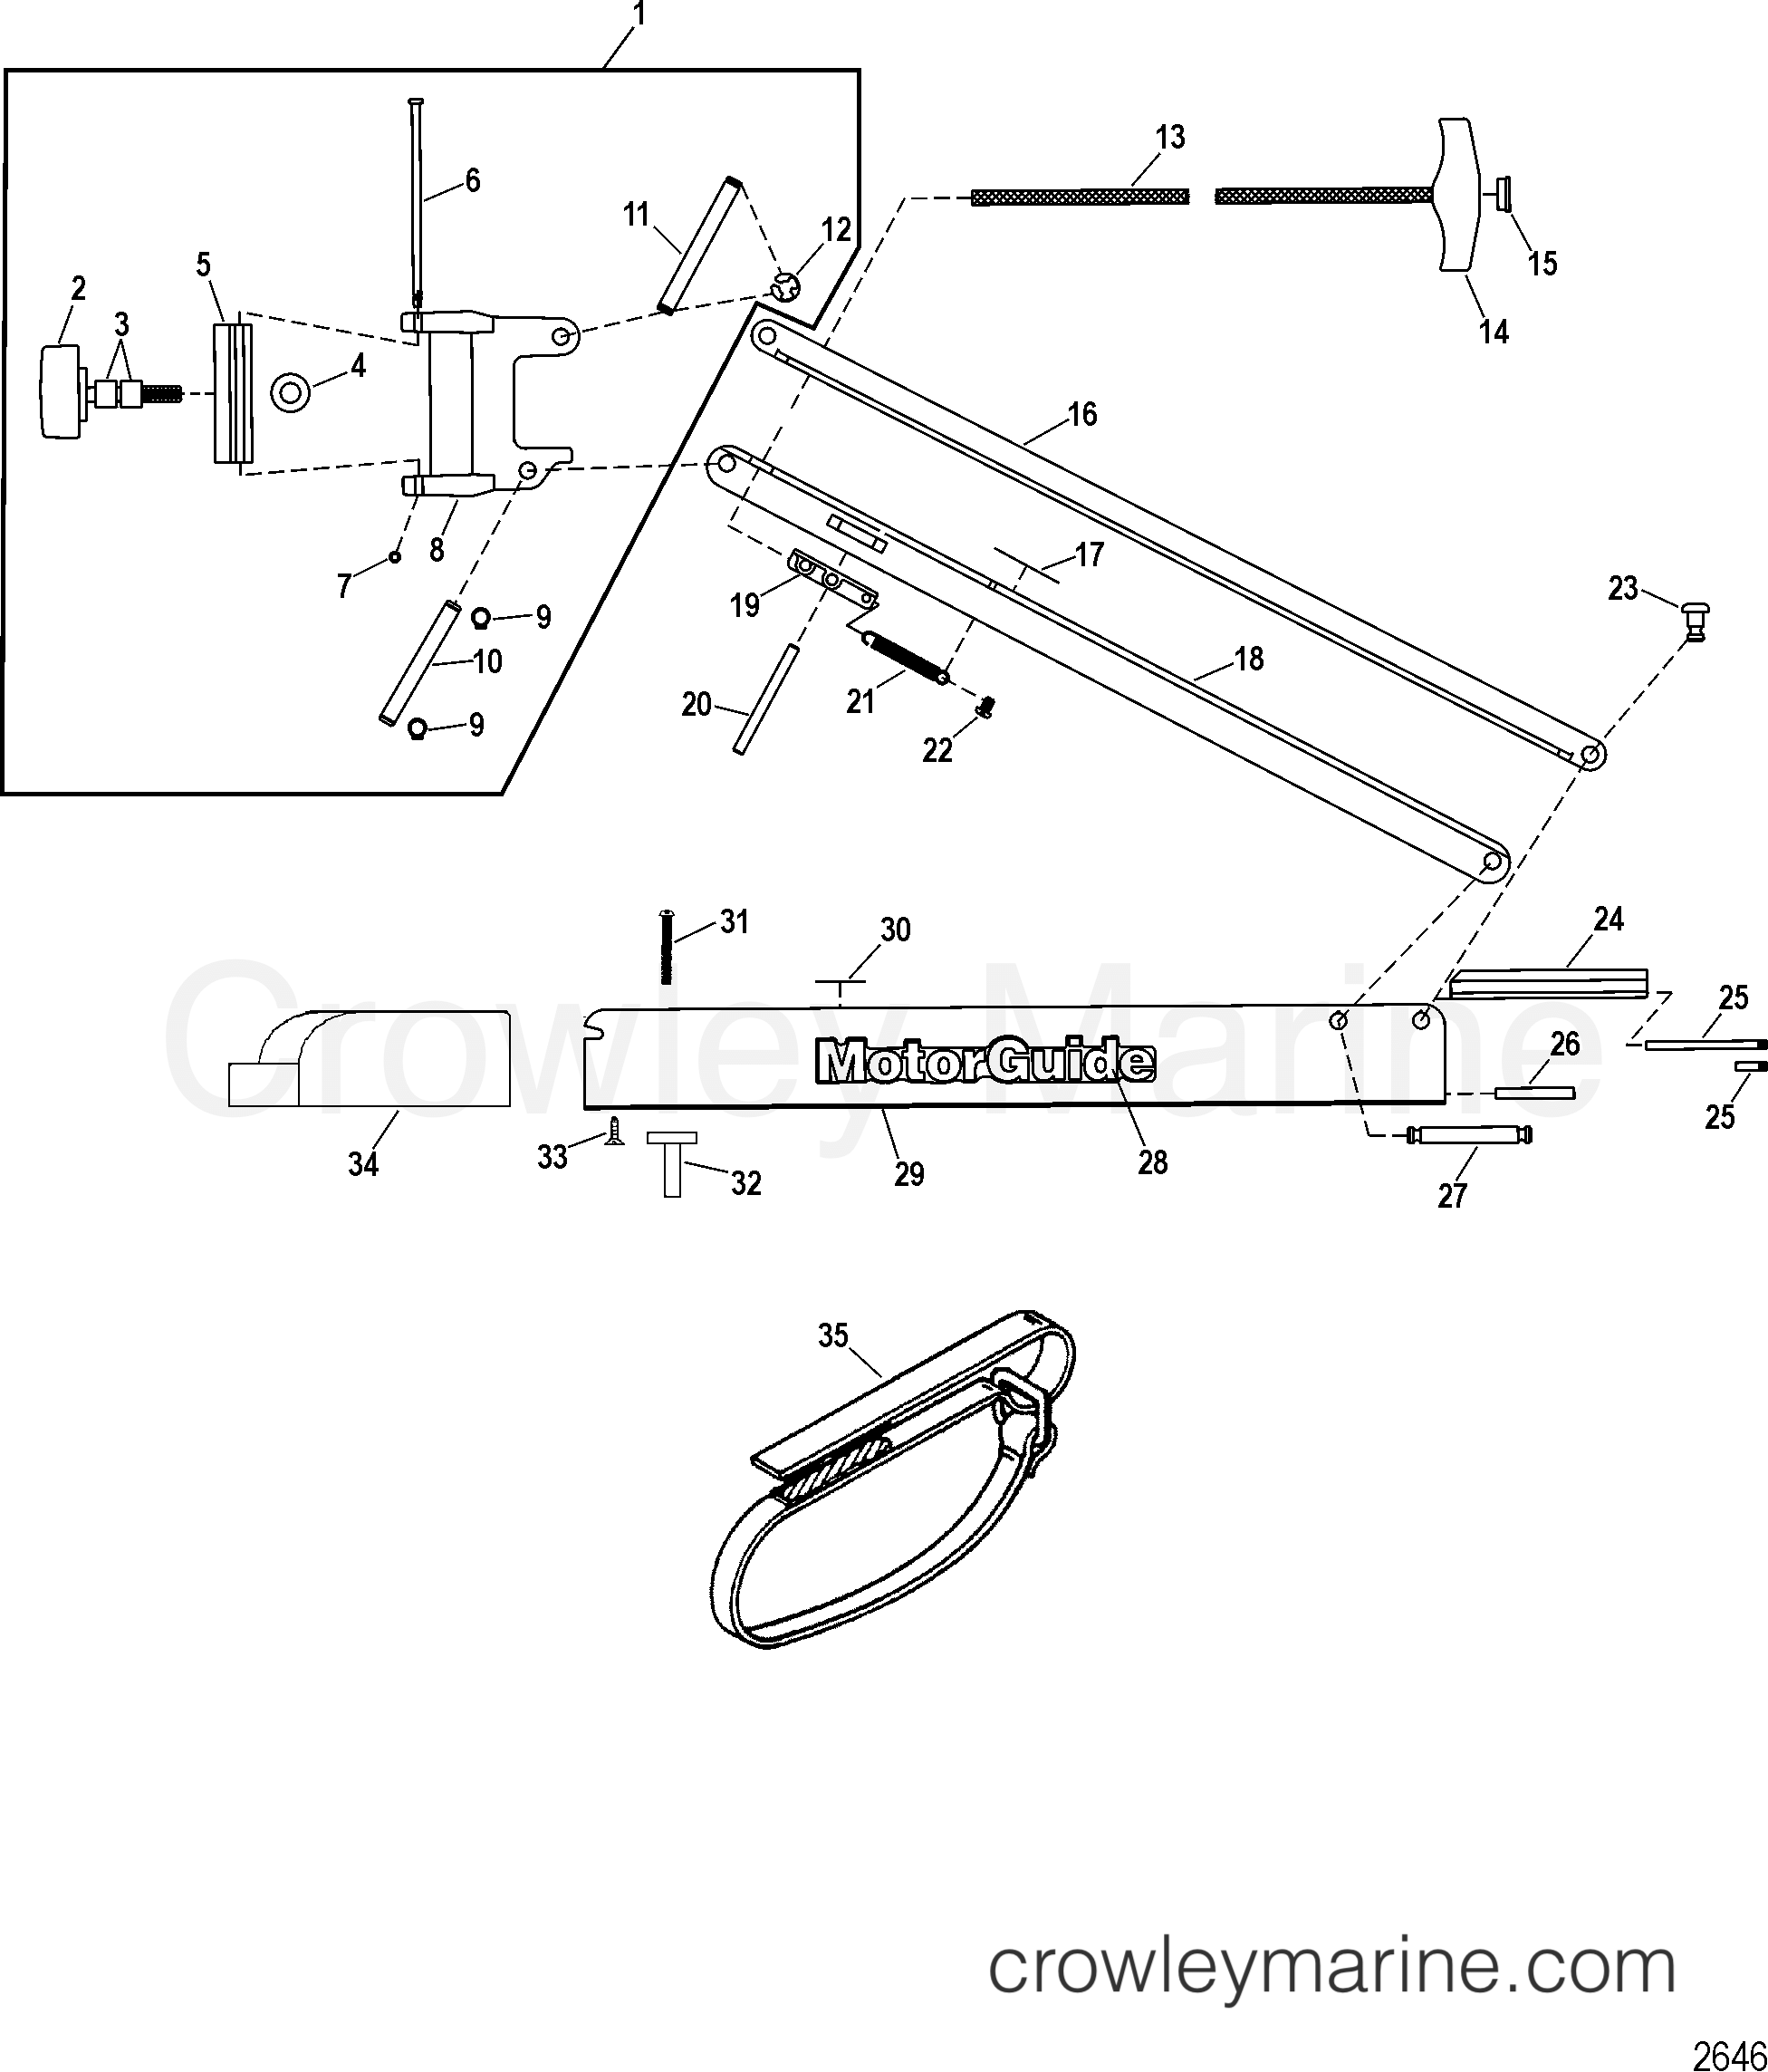 2006 MotorGuide 24V [MOTORGUIDE] - 921310264 07 BOW (BLACK)(42.00 INCH) (MST90742A) section